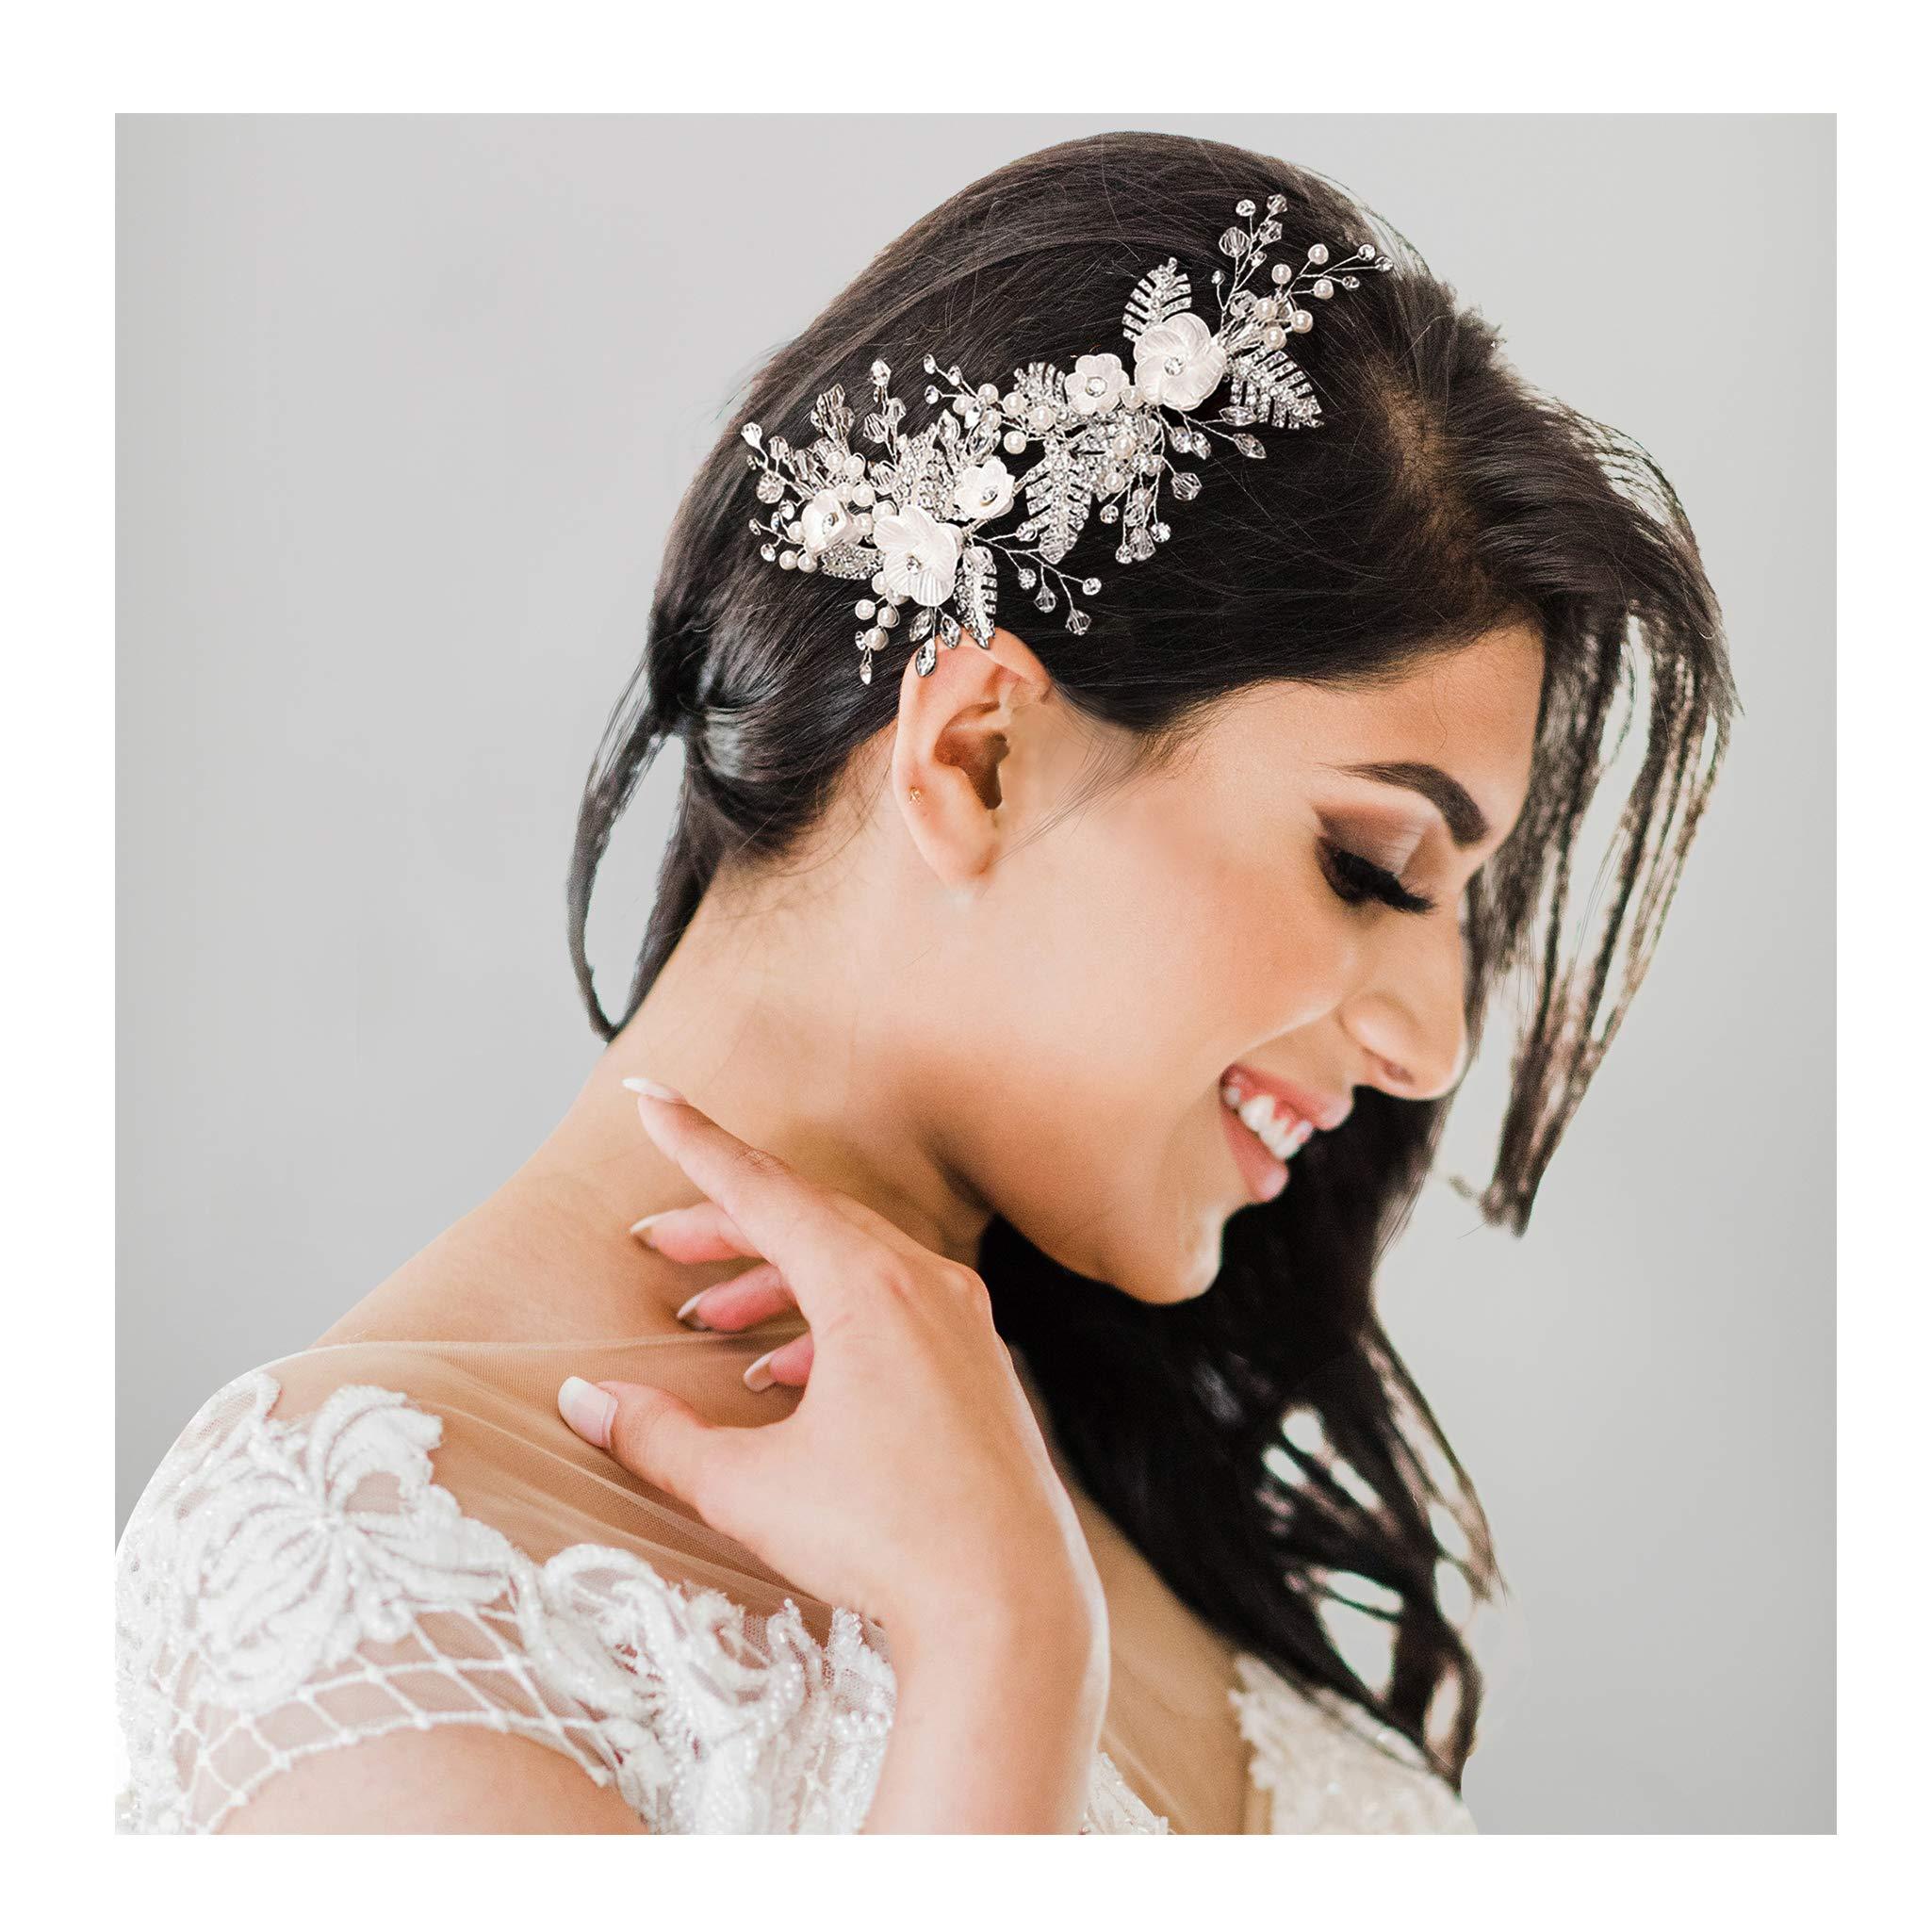 SWEETV Handmade Wedding Hair Clip Barrette Comb,Rhinestone Floral Bridal Wedding Hair Accessories for Brides Silver by SWEETV